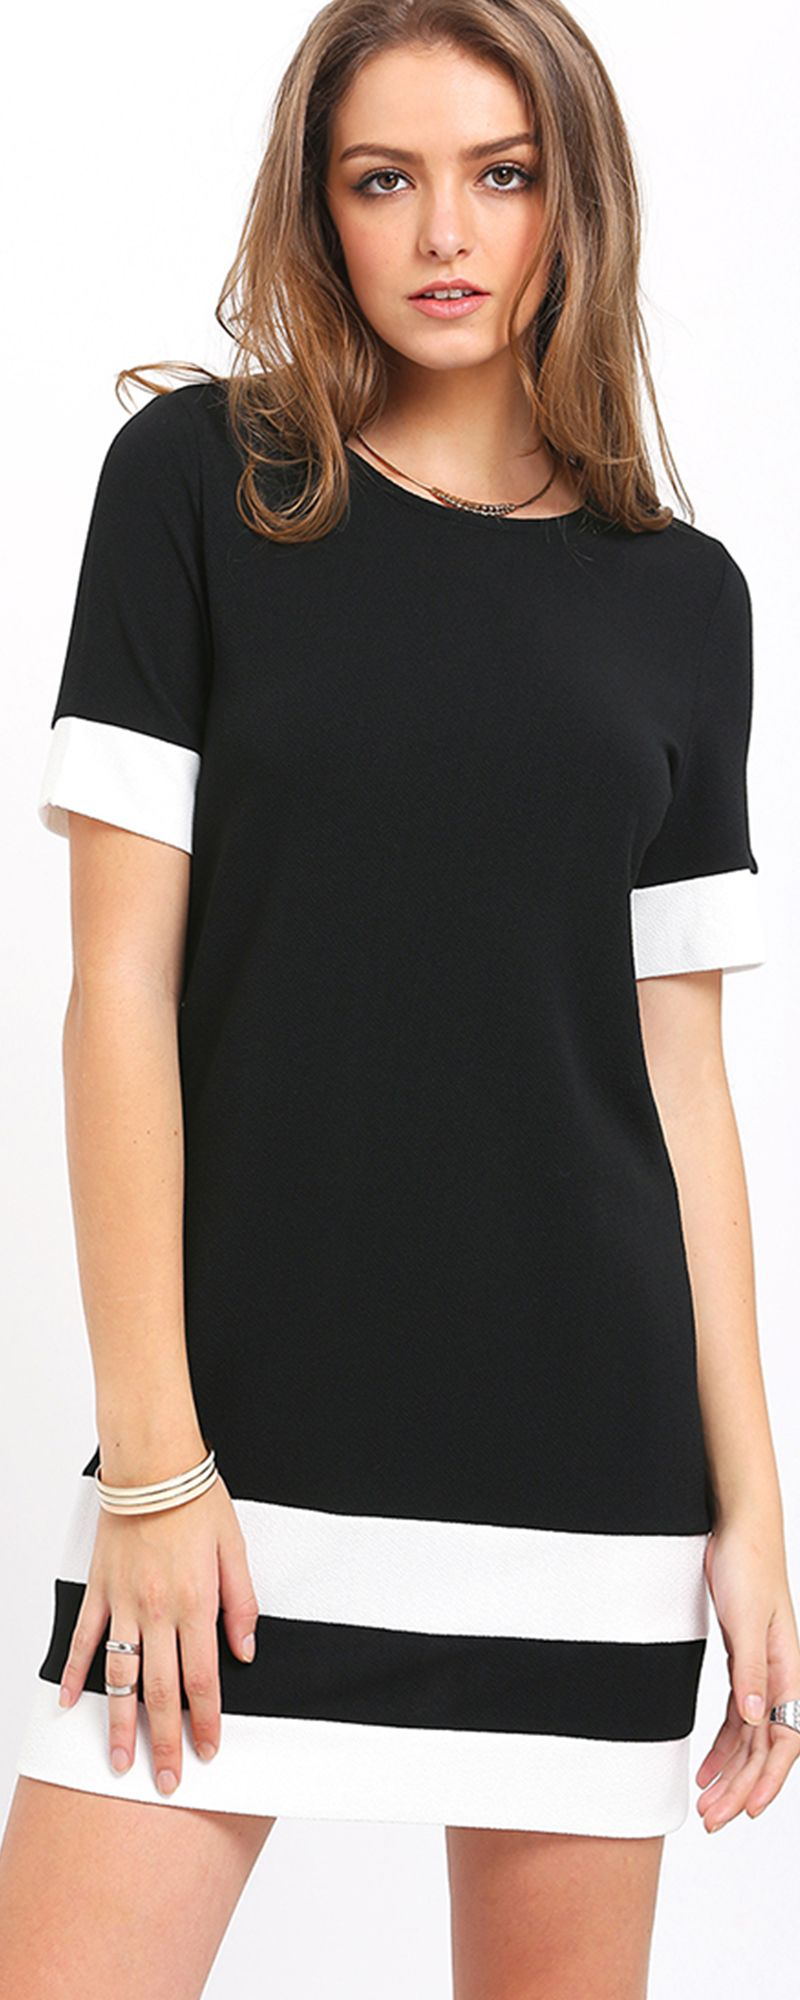 1a2650975c Black White Patchwork Short Sleeve Shift Dress